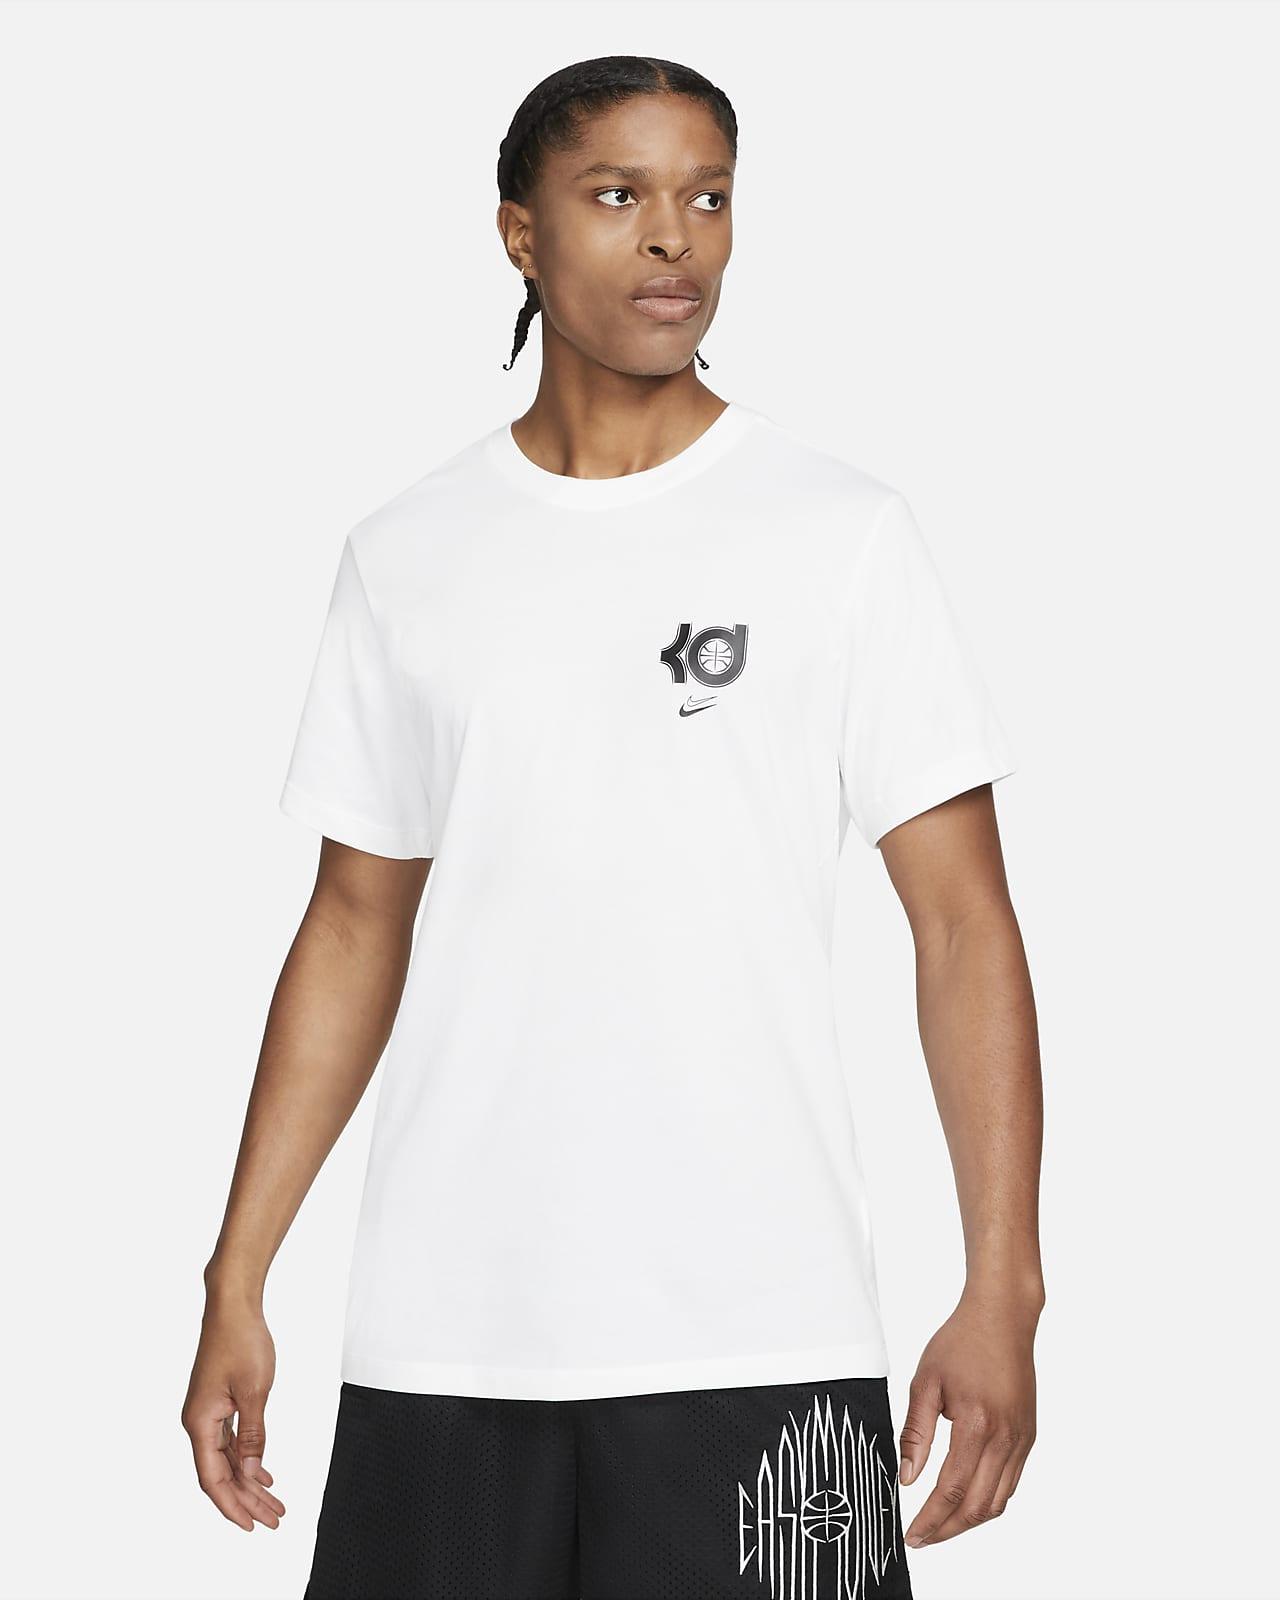 Playera de básquetbol para hombre Nike Dri-FIT KD Logo